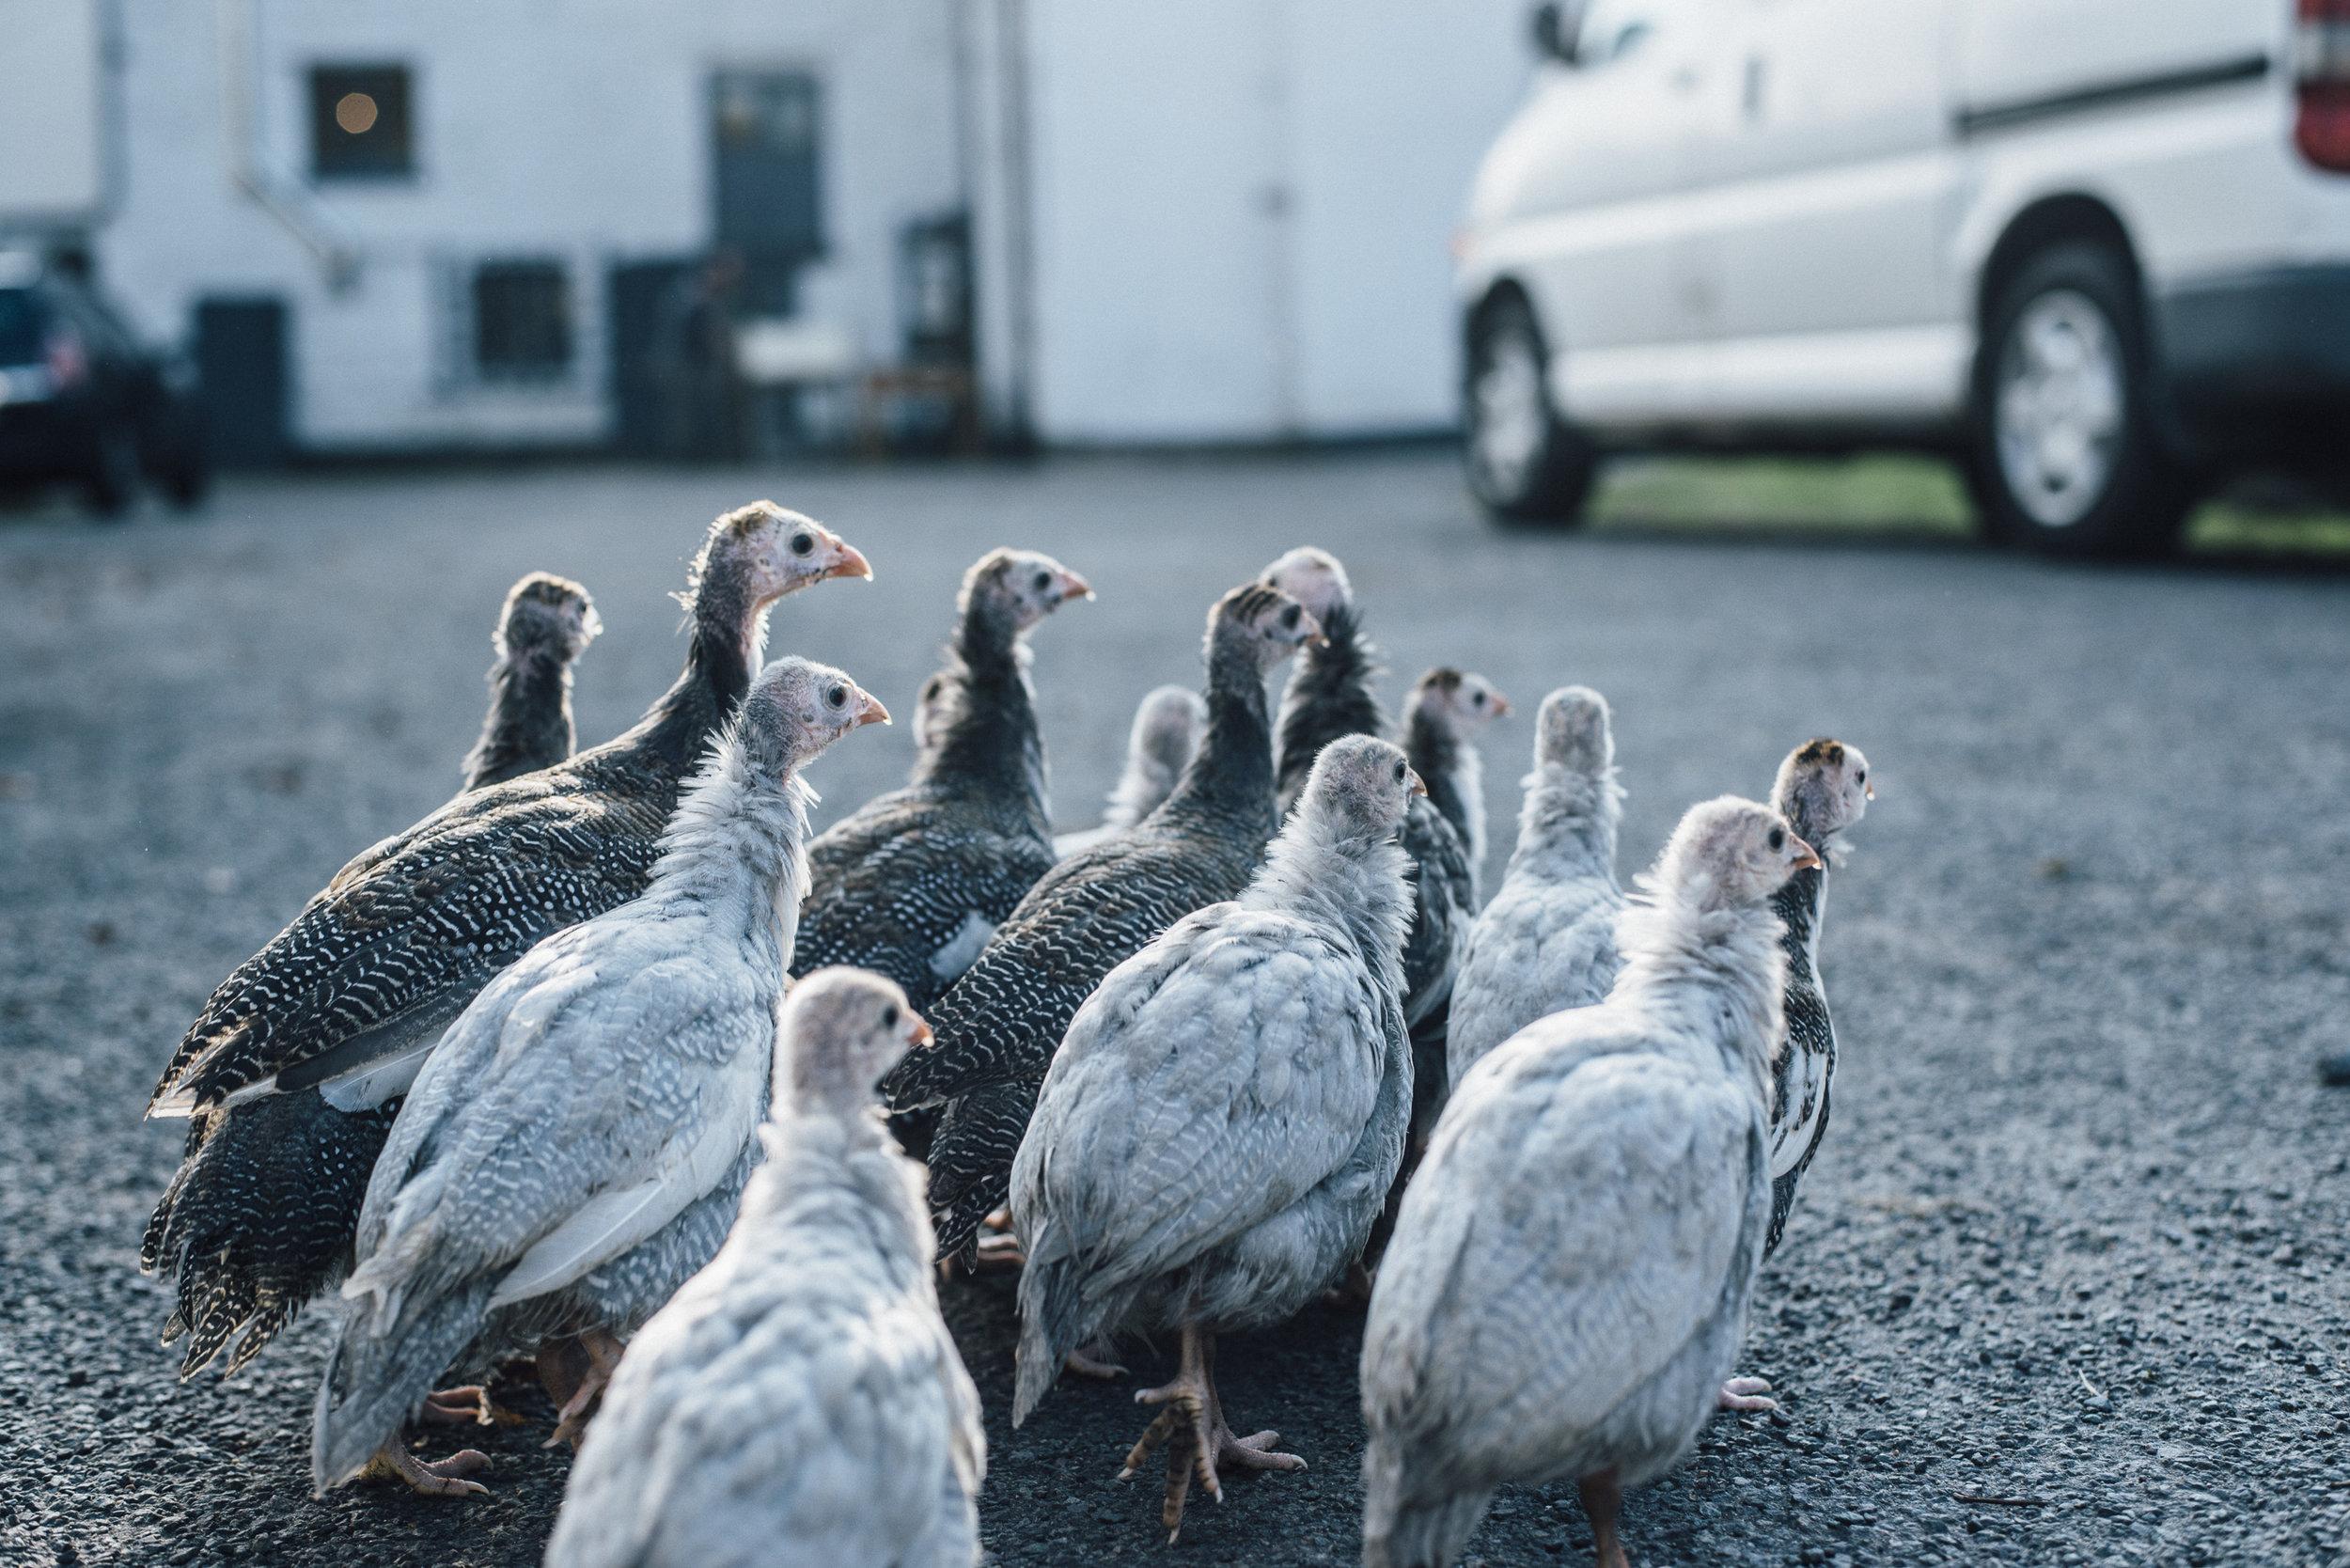 The Cotes Mill Guinea Fowl